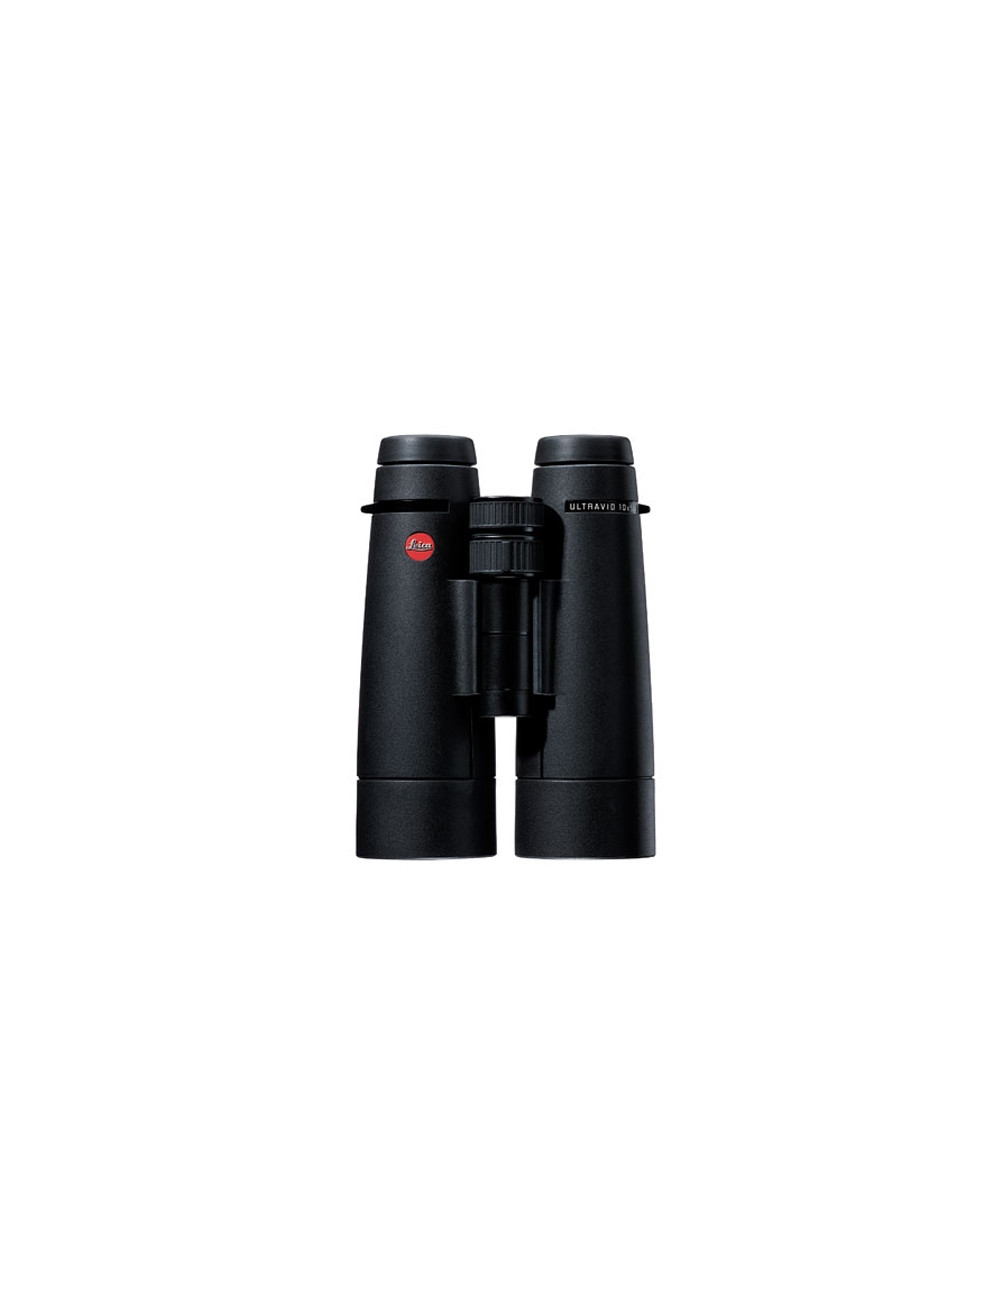 195 - Jumelles LEICA 10X50 Ultravid HD